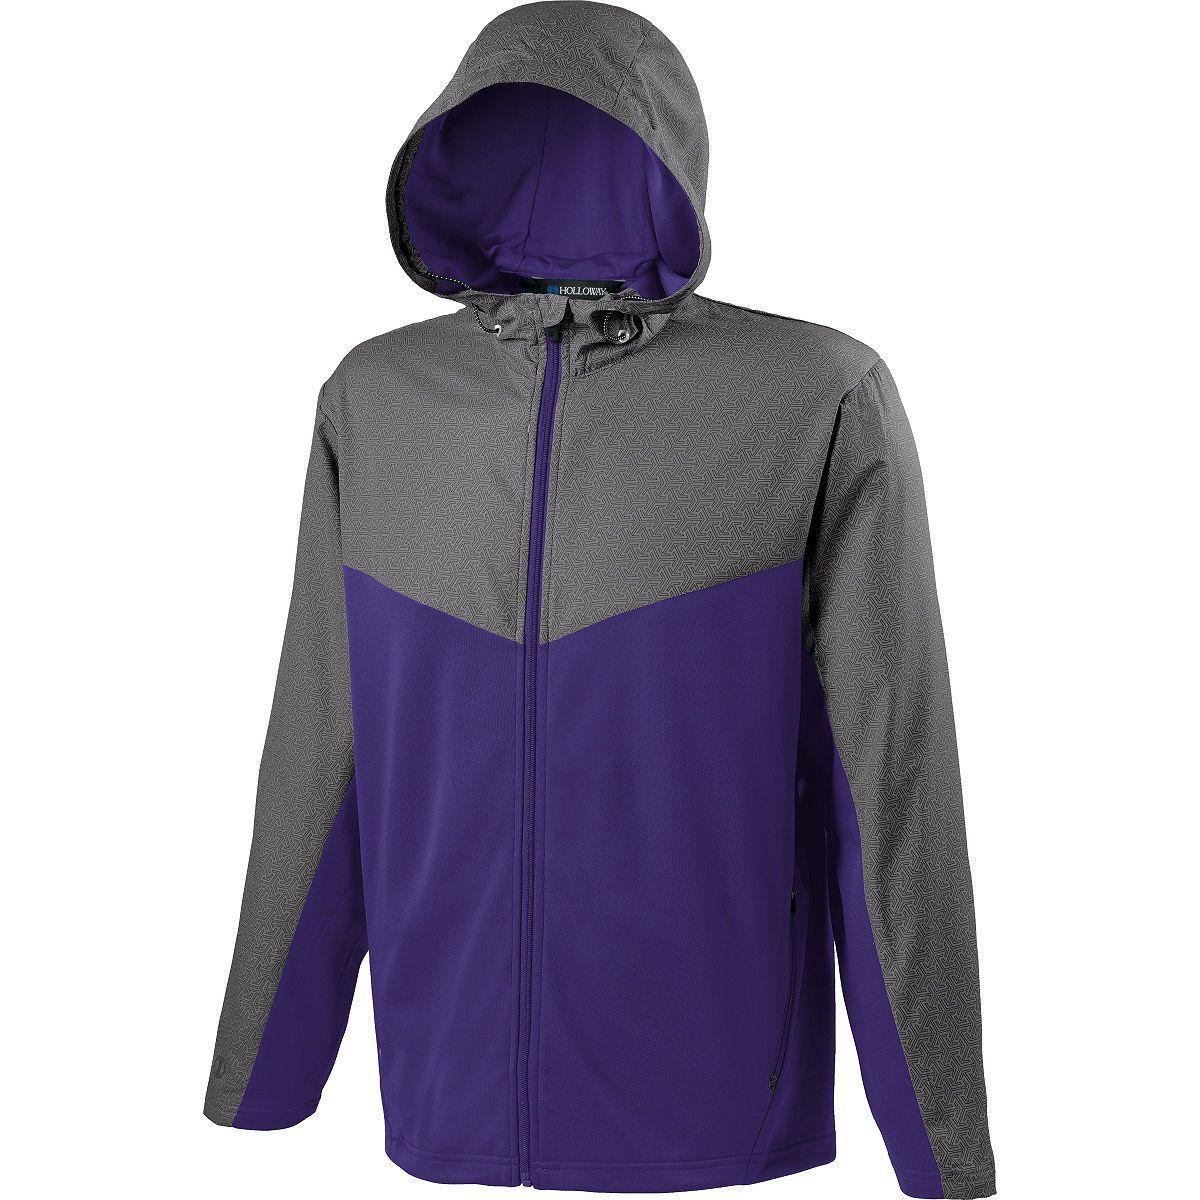 Adult Crossover Jacket - GREY PRINT/PURPLE